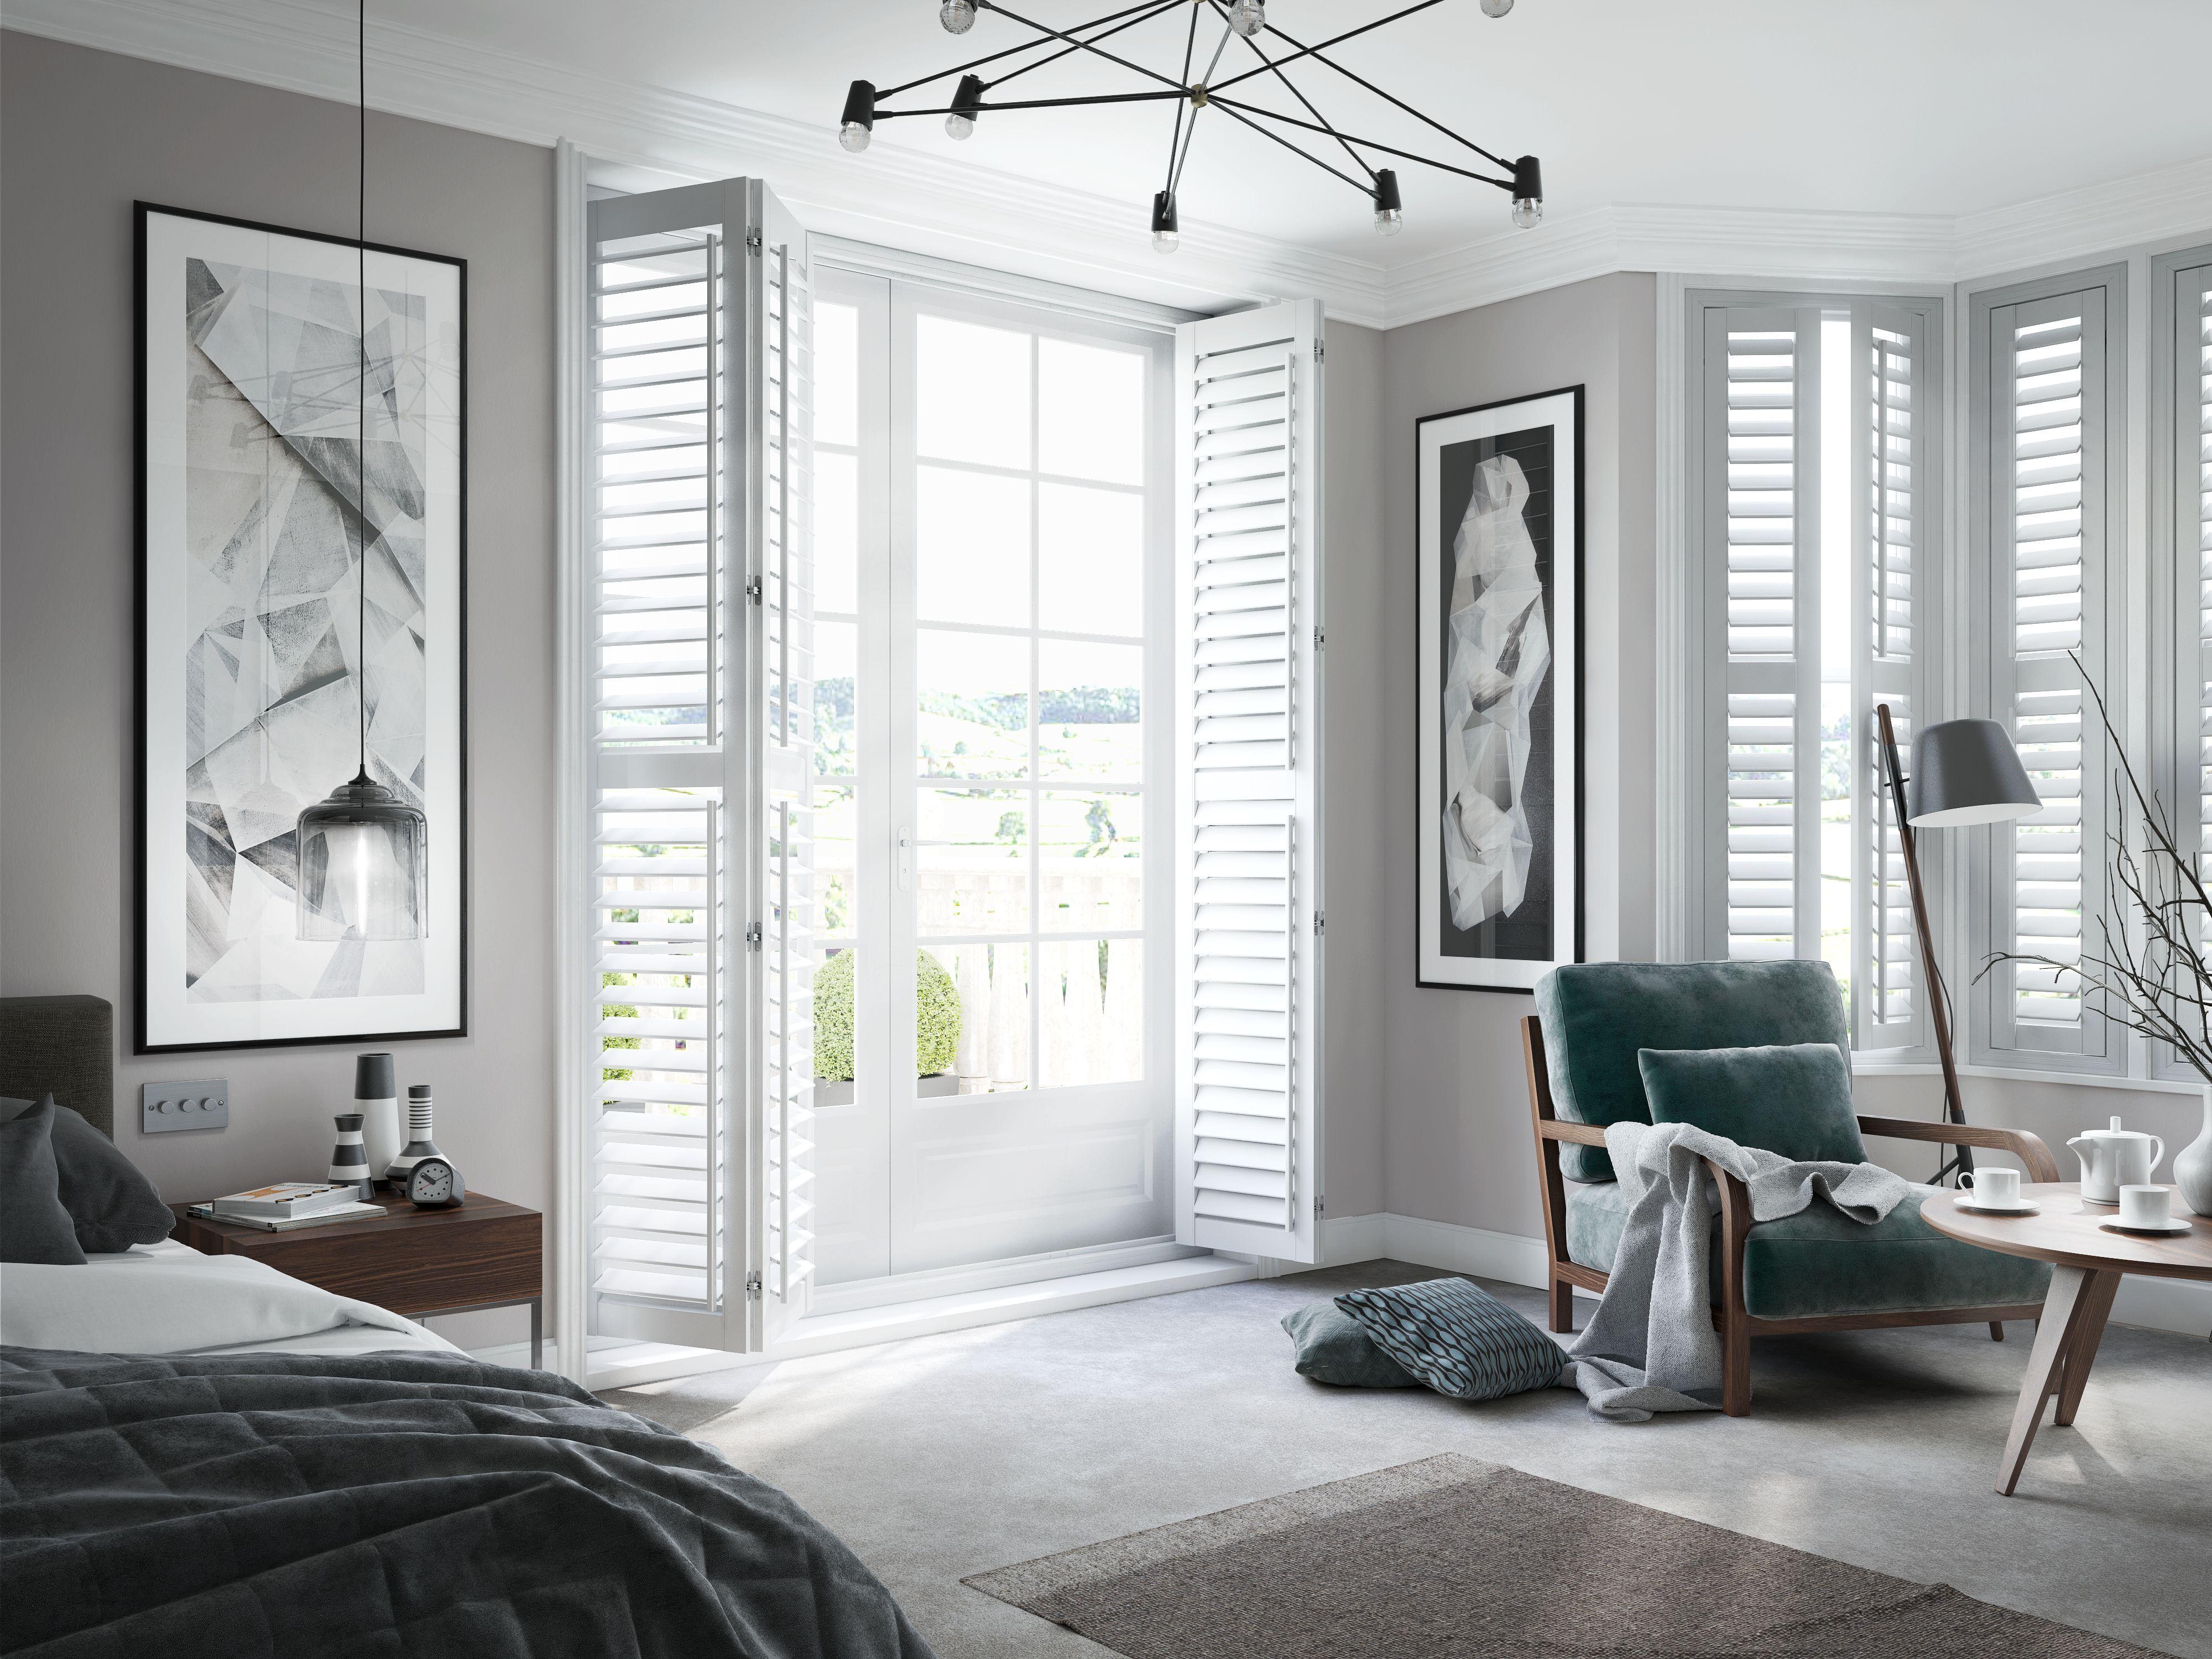 Bedroom With White Full Length Shutters In 2019 Bedroom